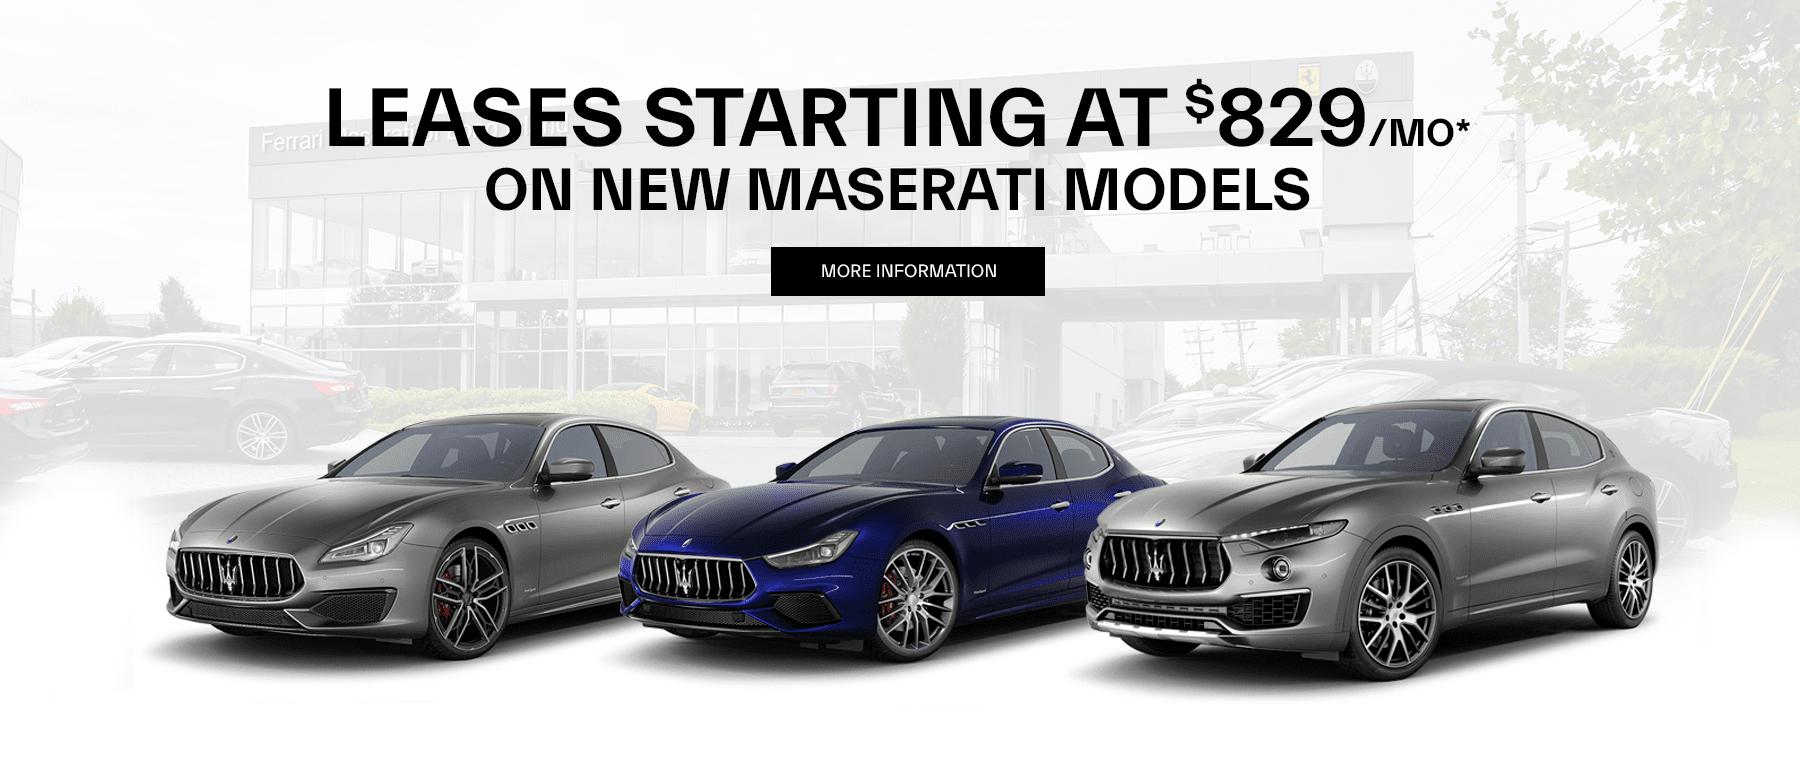 Maserati Lease in New York